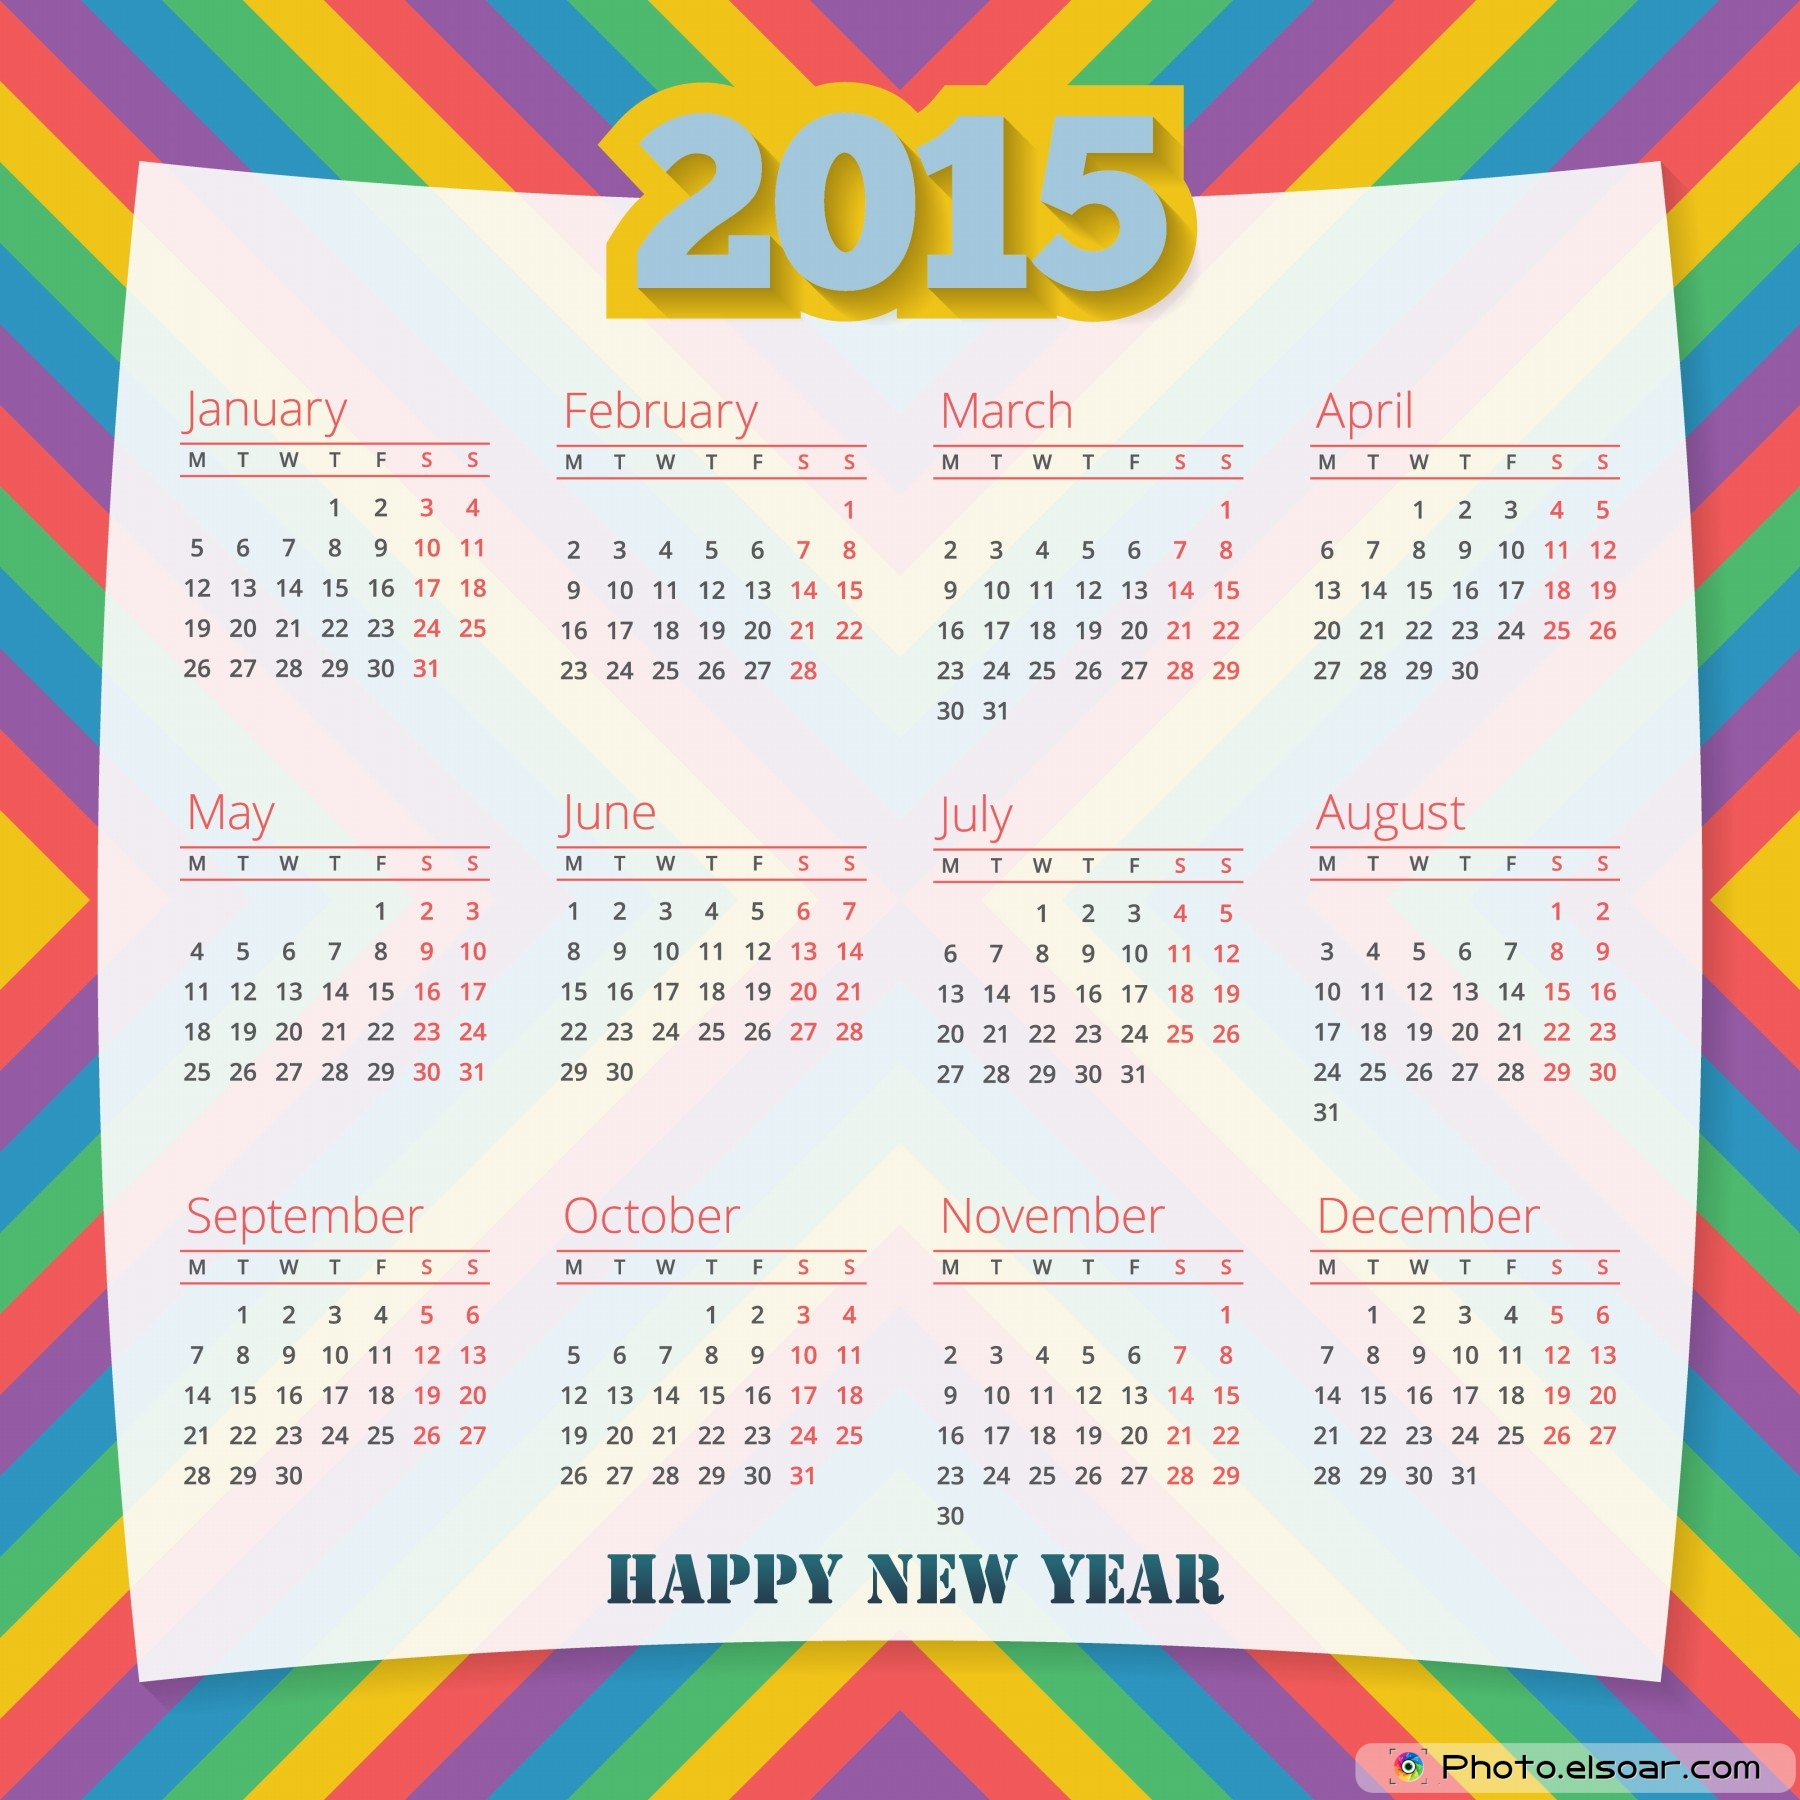 Chinese Calendar 2015